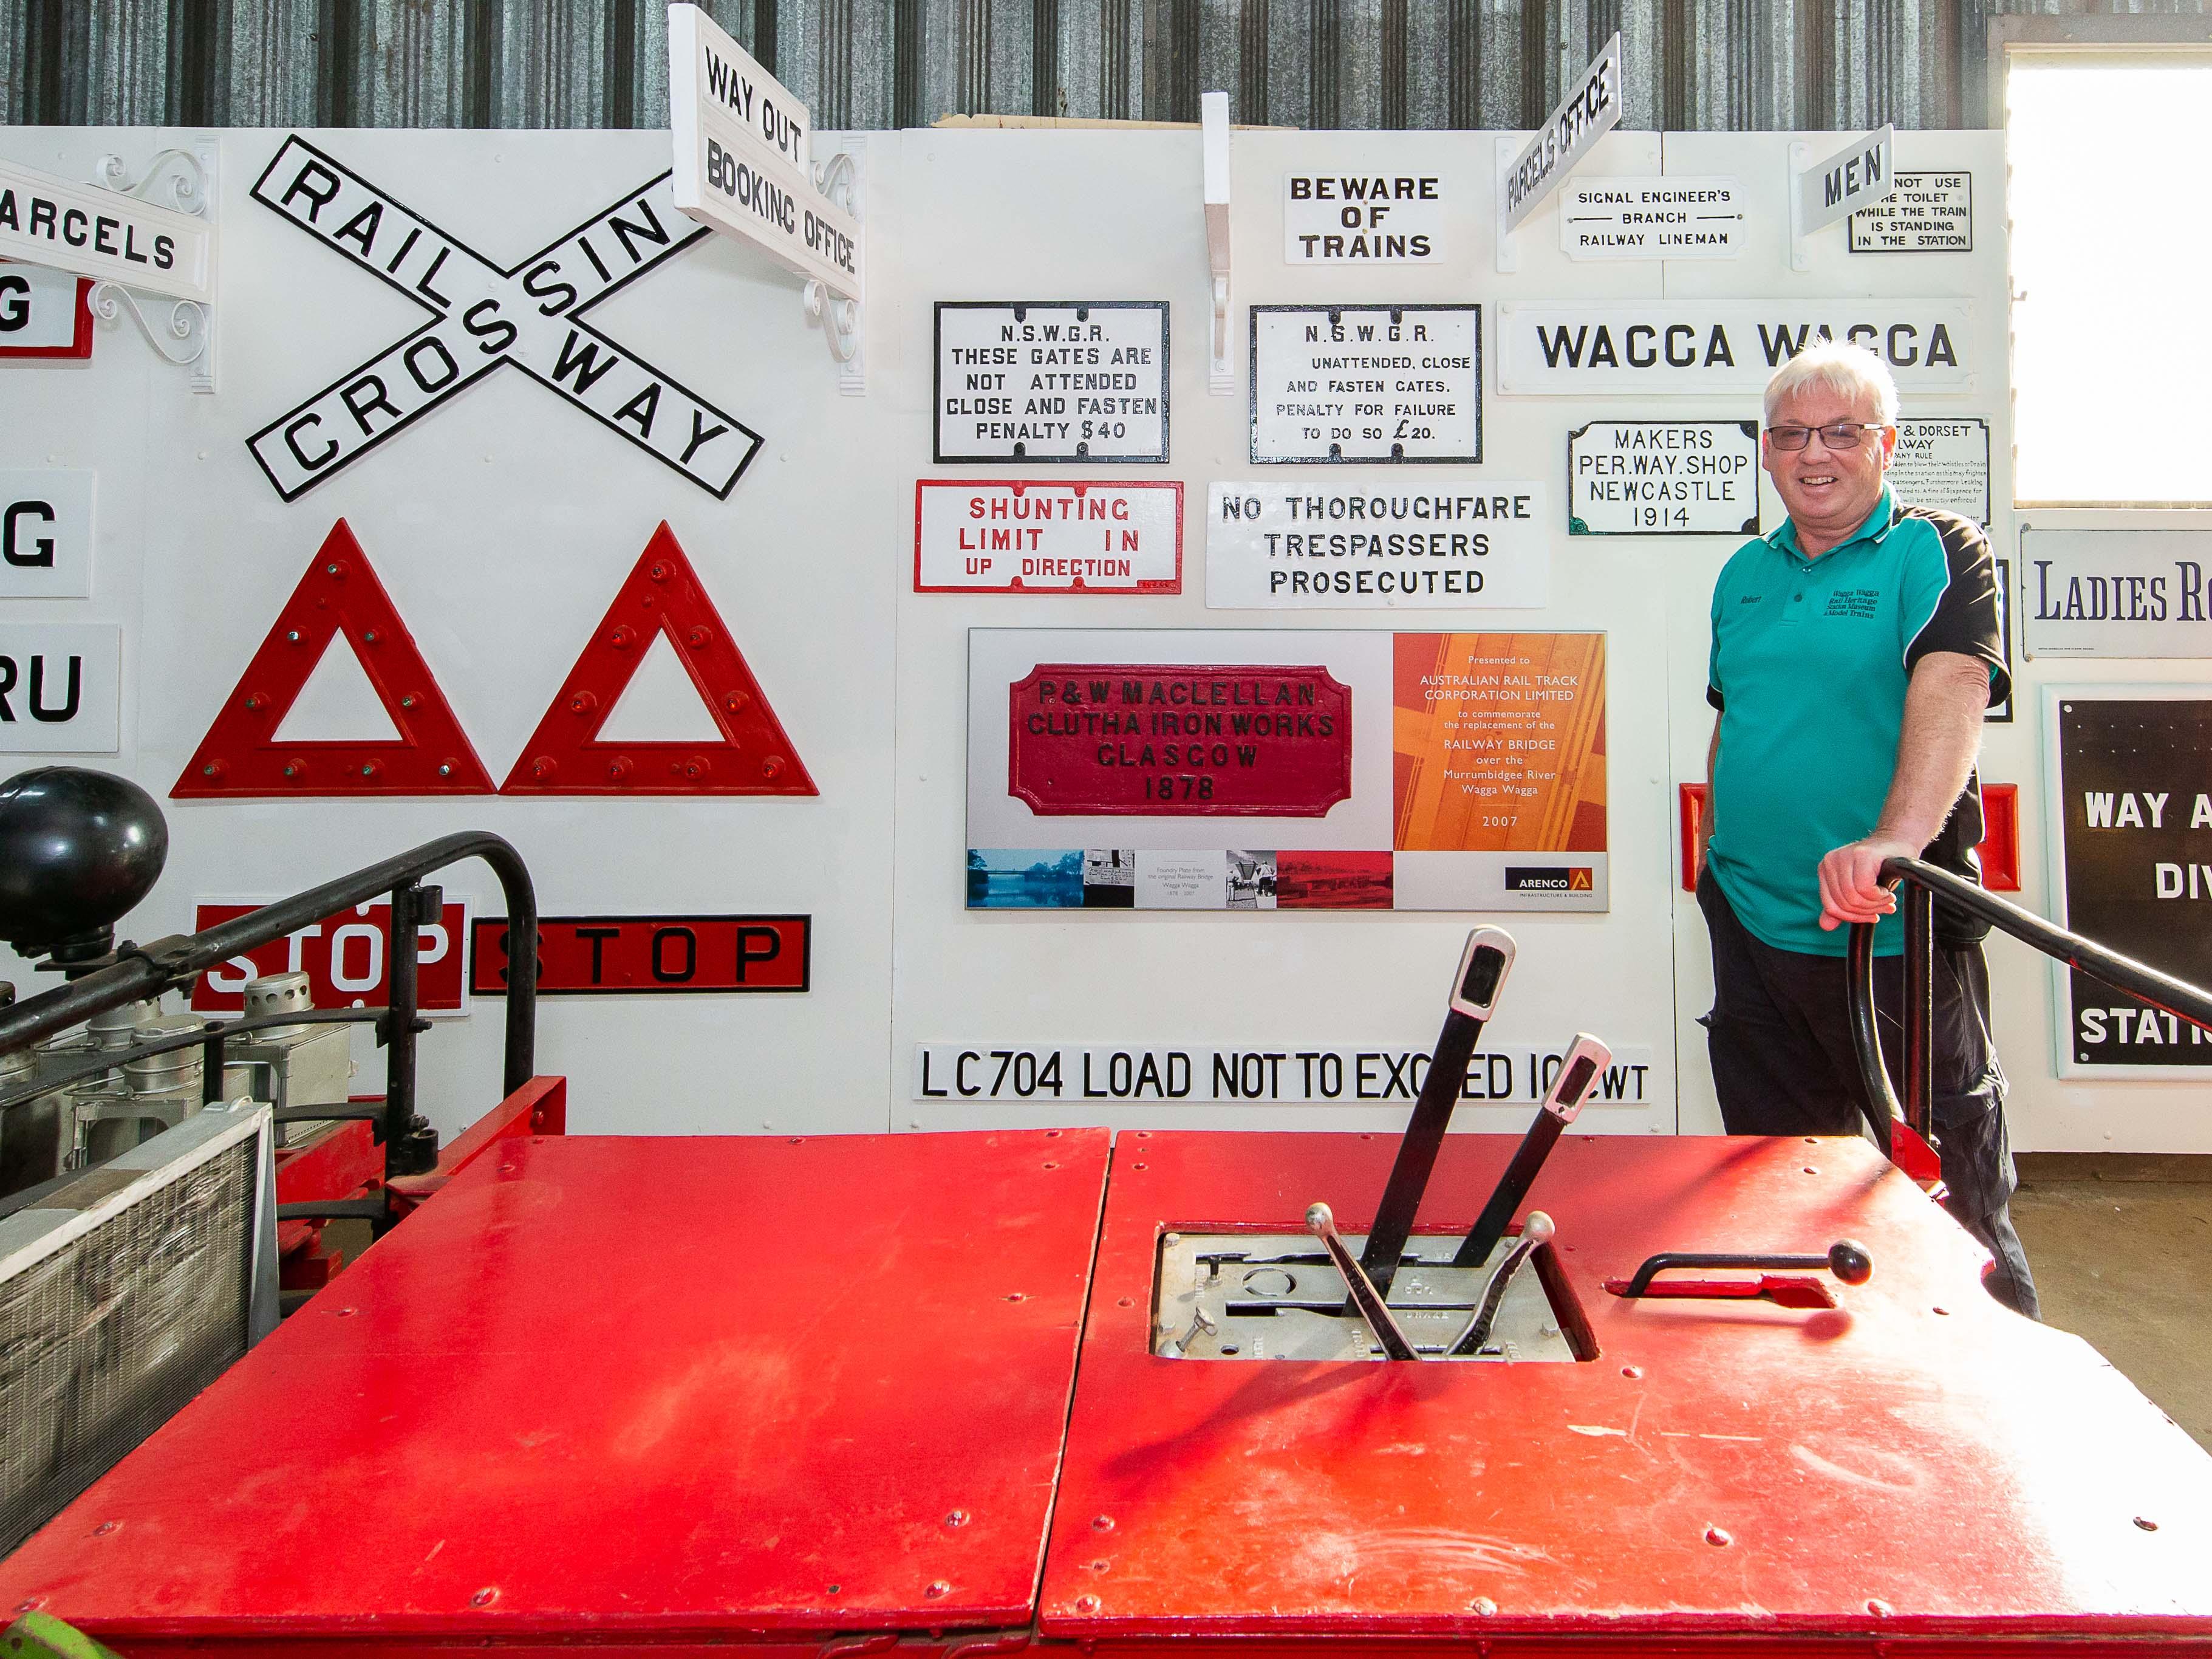 Wagga Wagga Rail Heritage Museum